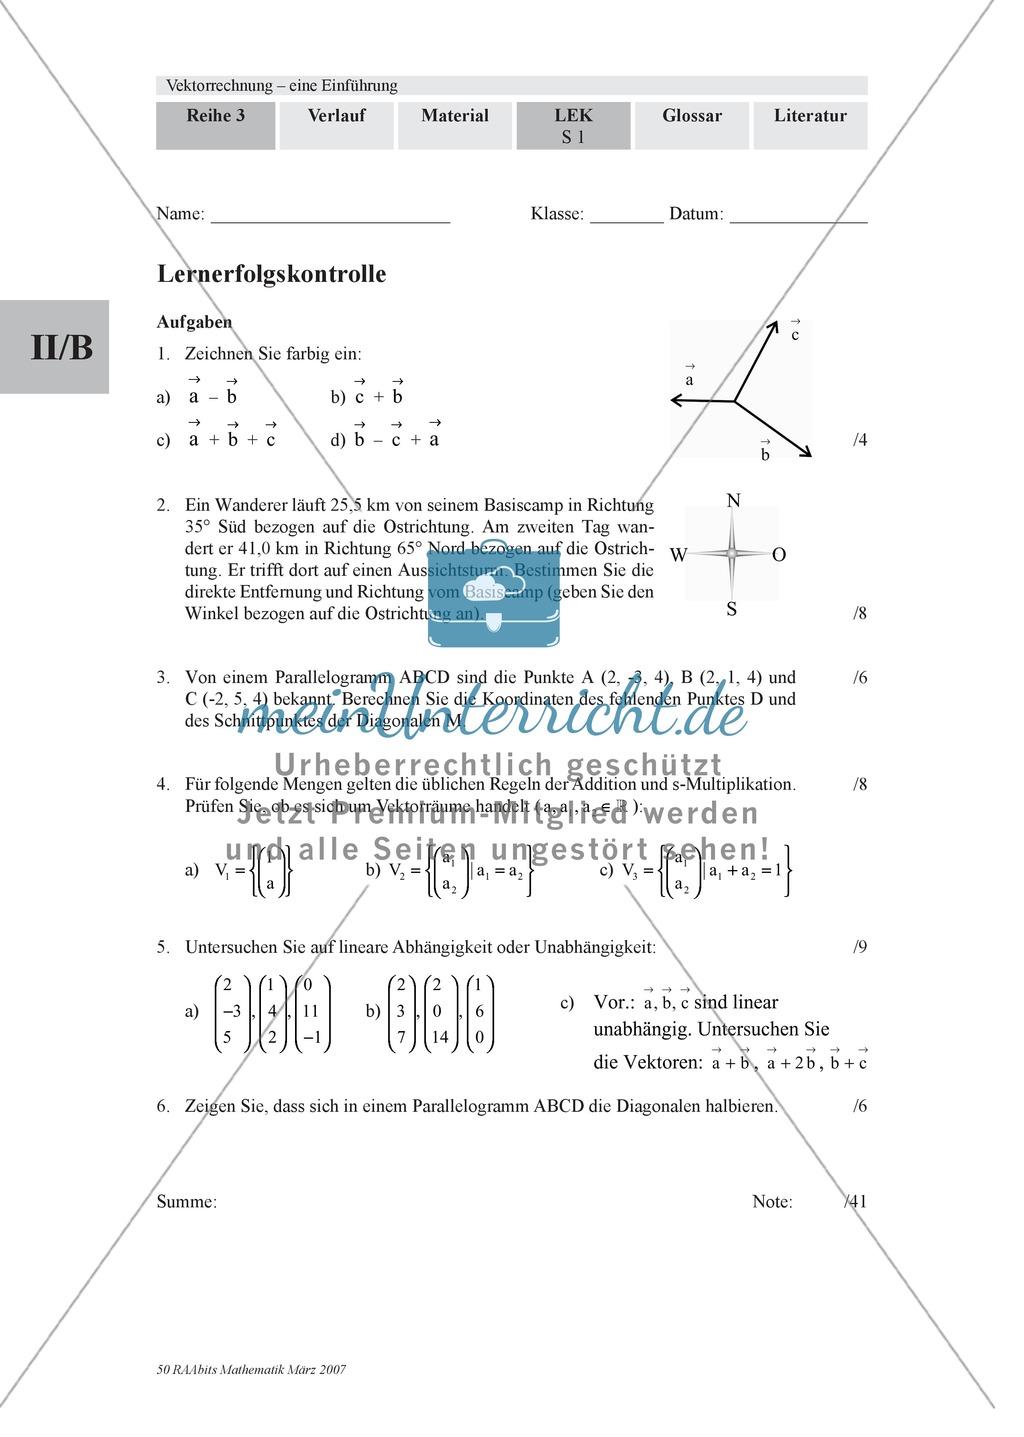 Beste Einführung In Die Geometrie Arbeitsblatt Fotos - Super Lehrer ...